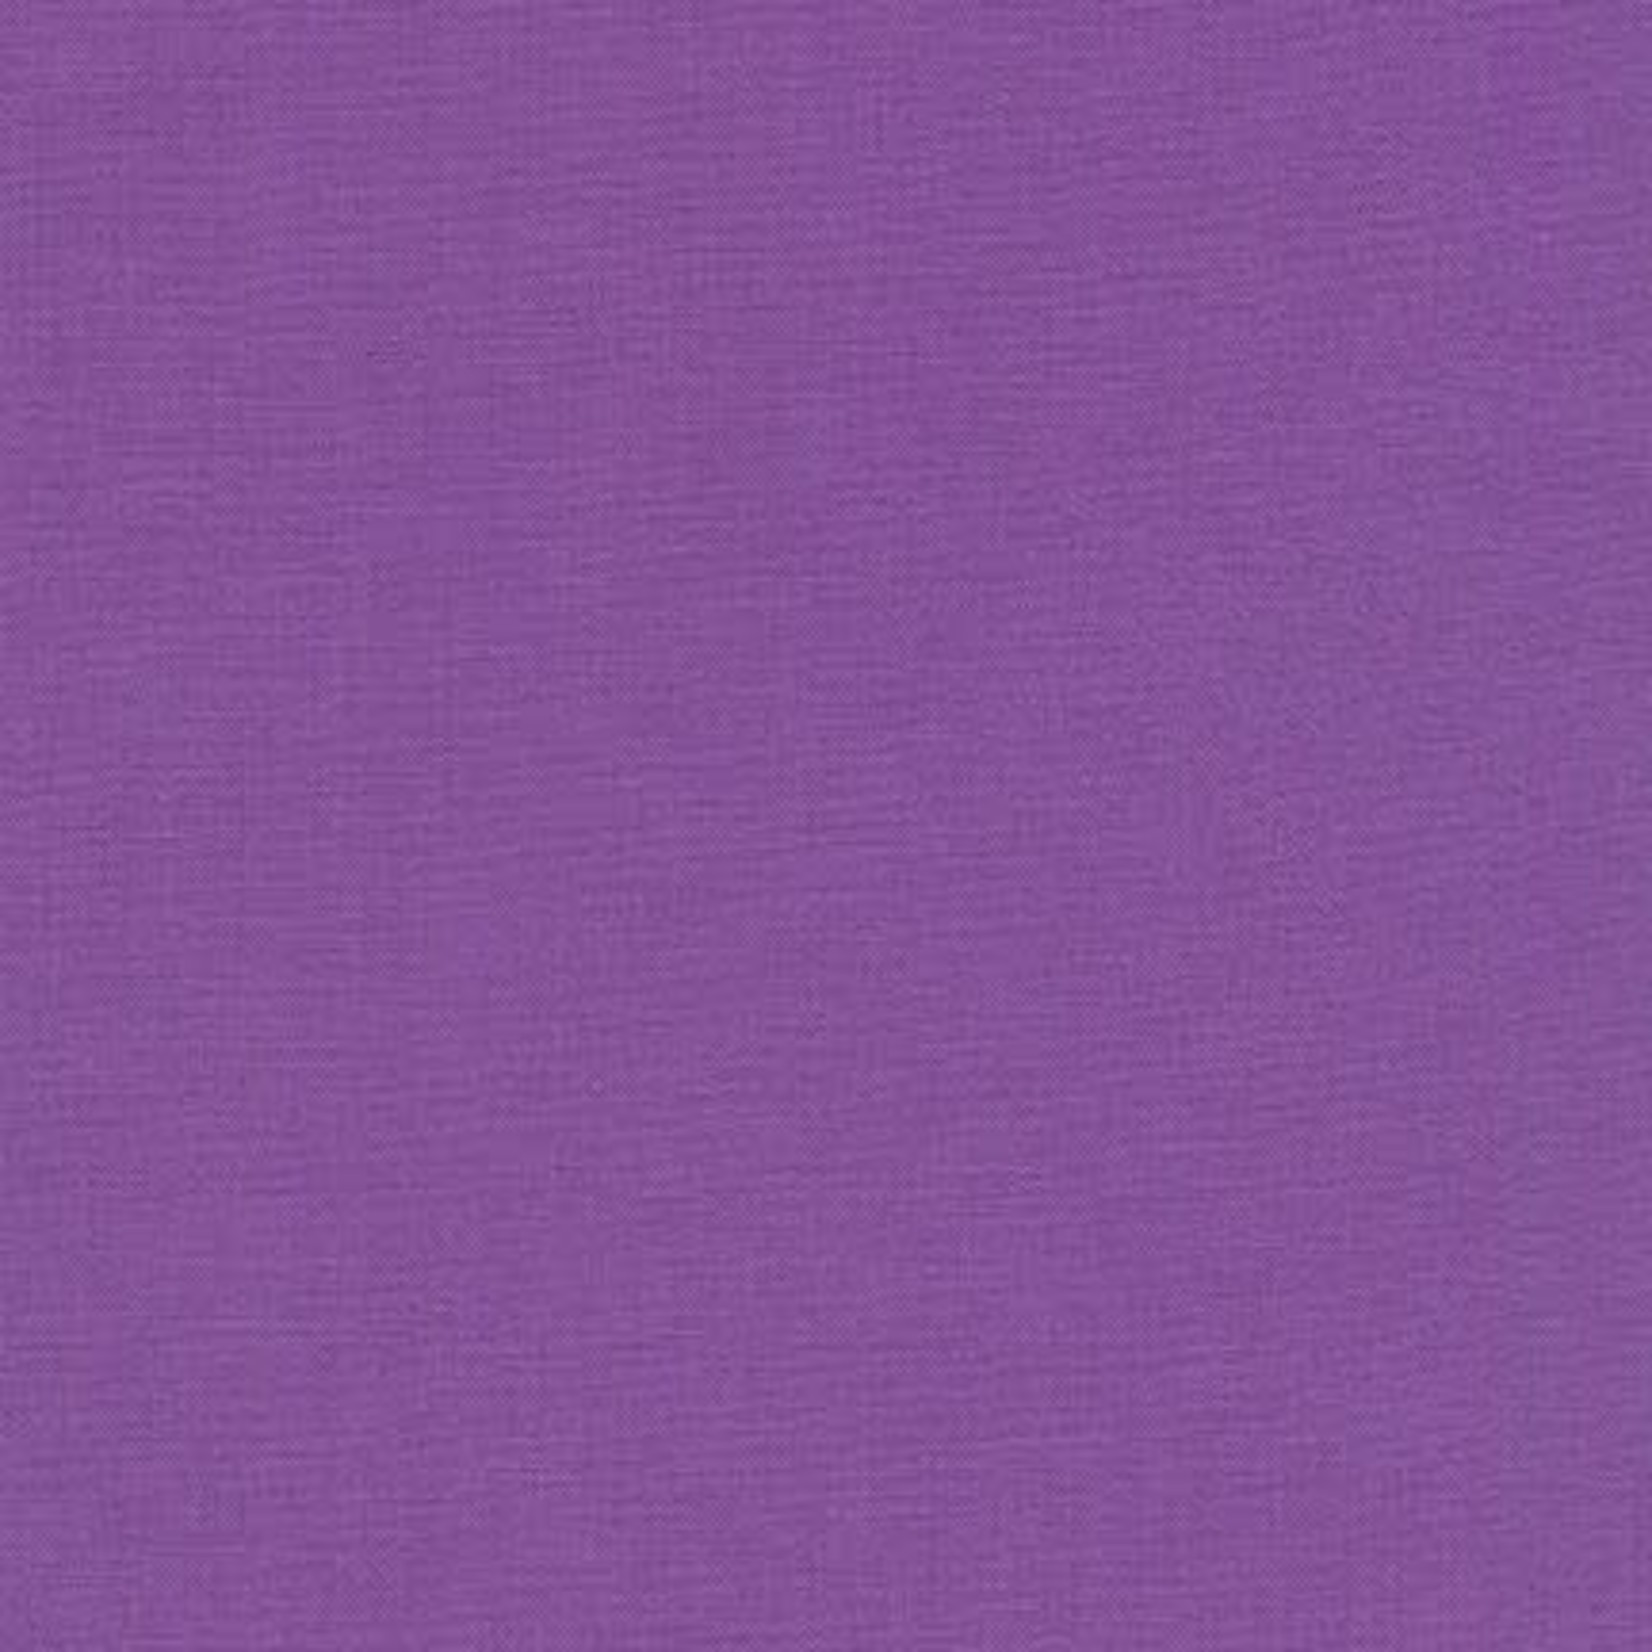 KONA KONA  K001-142 CROCUS, PER CM OR $14/M